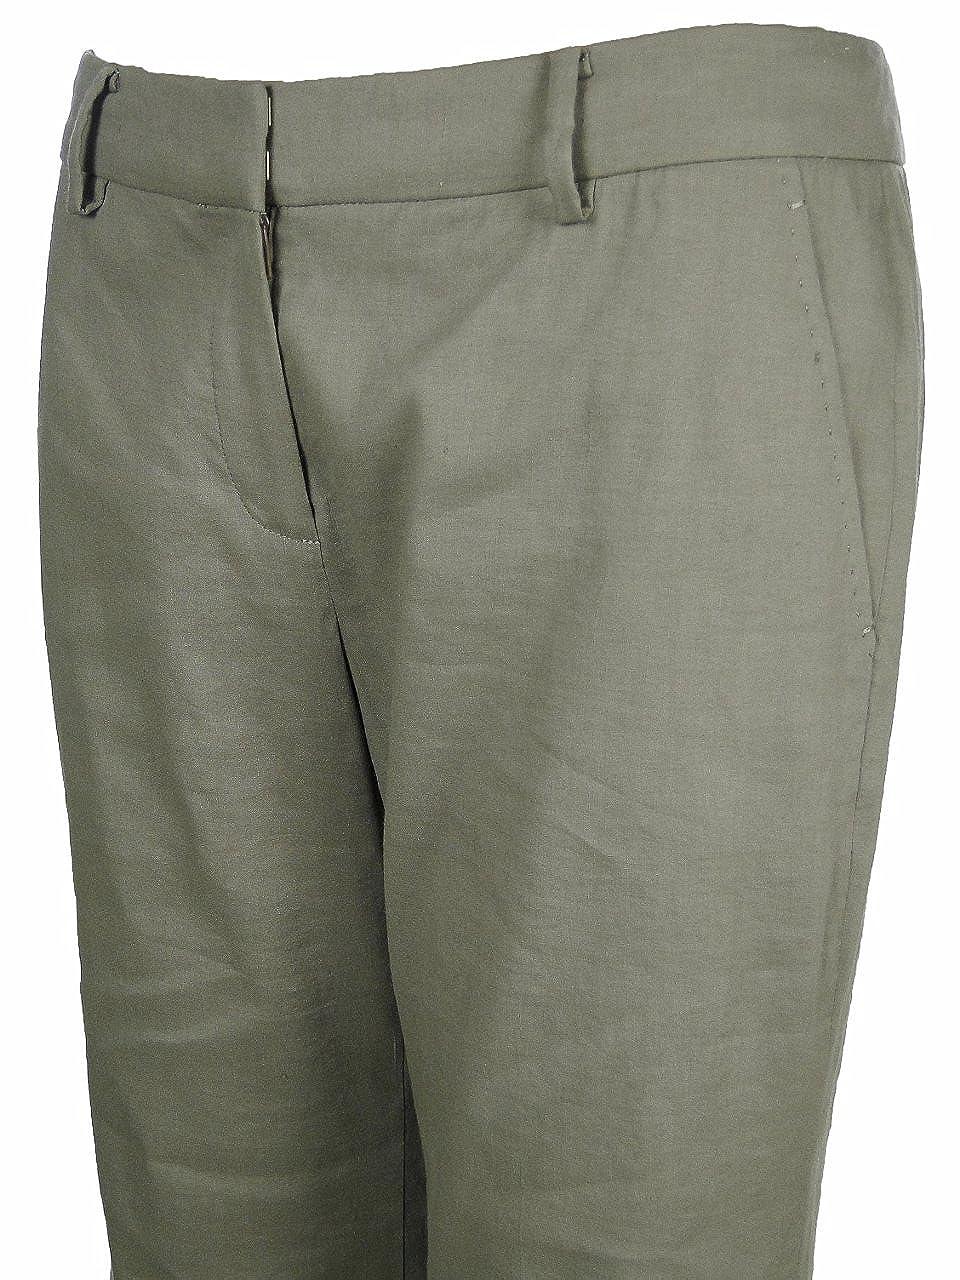 Elie Tahari Womens Linen Blend Wide-leg Trouser Pants Mushroom Brown Size 2